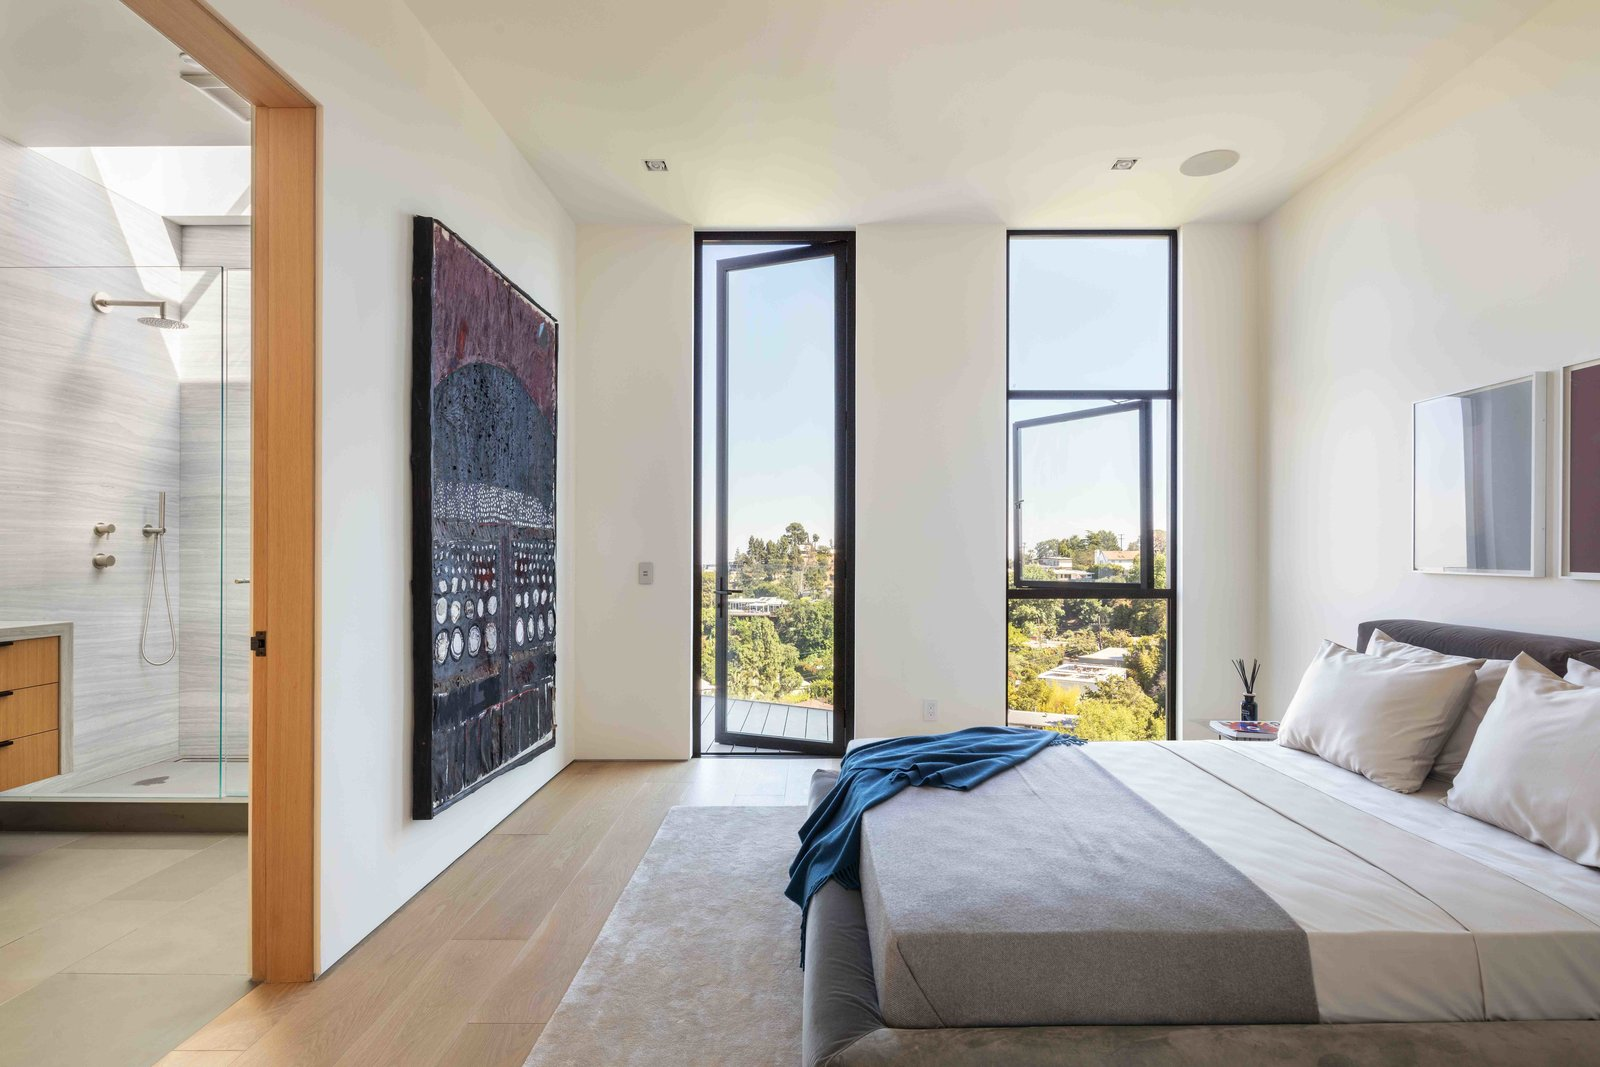 Carla House bedroom